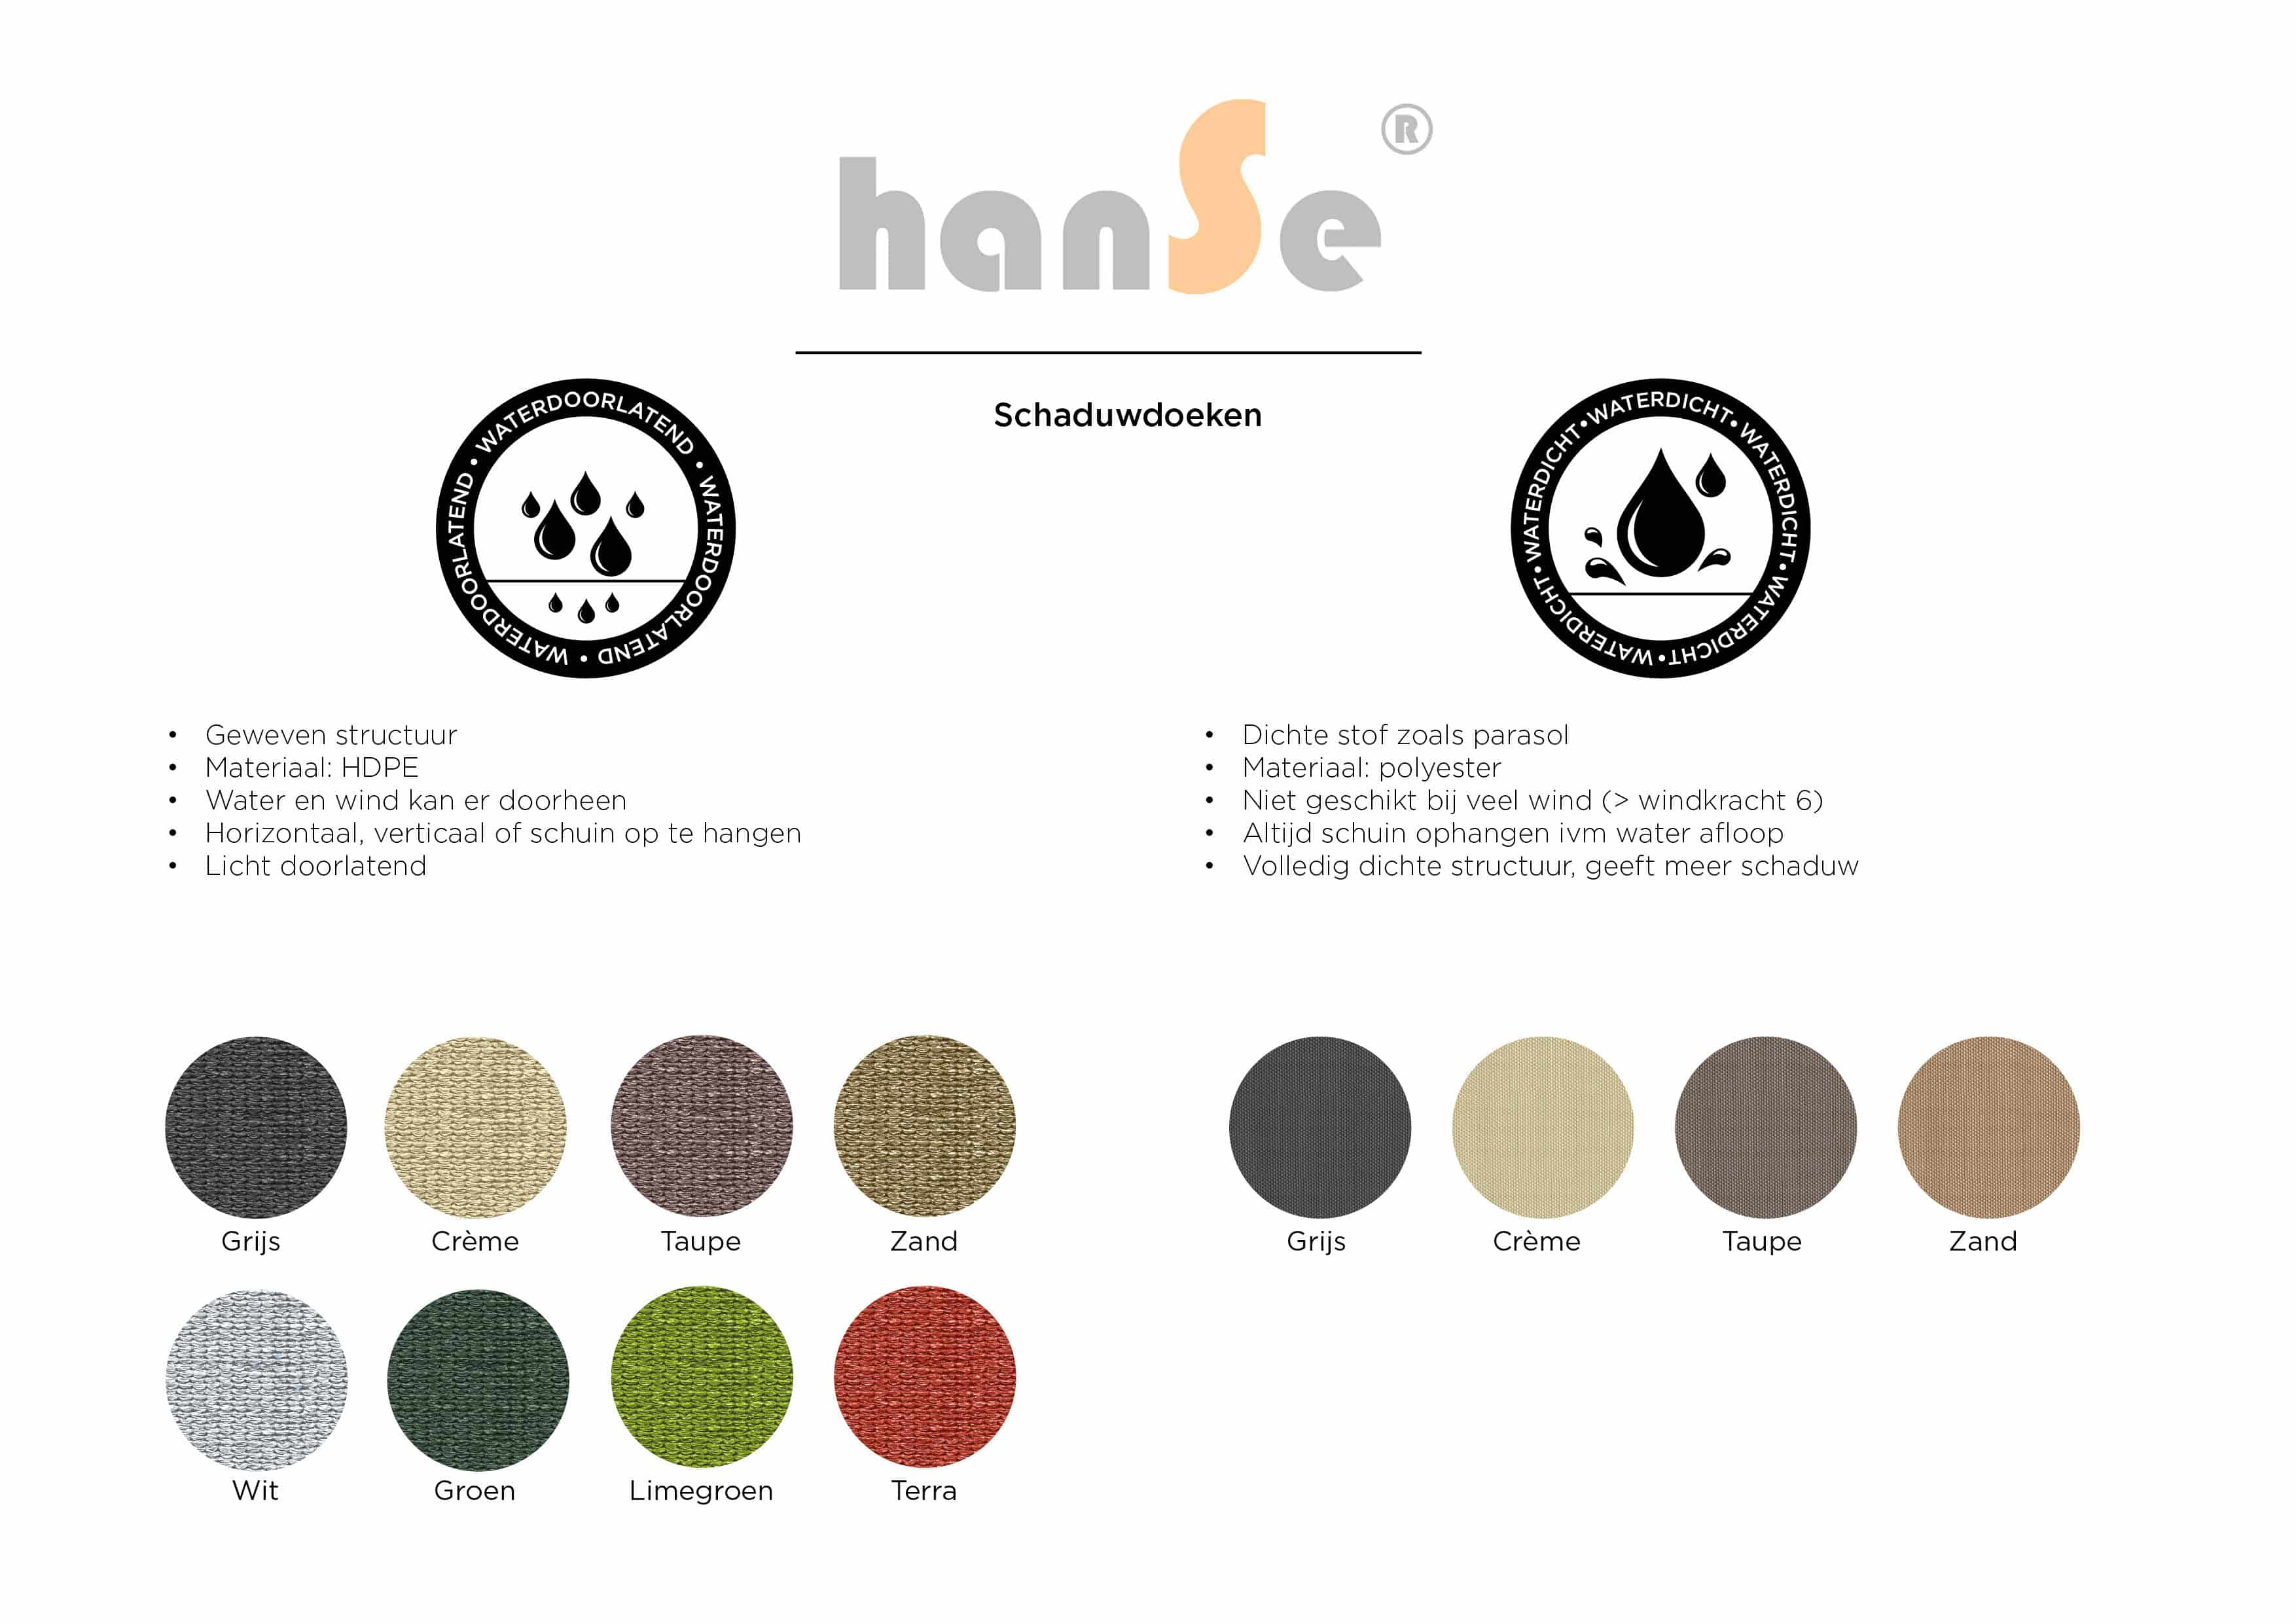 hanSe® Schaduwdoek Driehoek 90° Waterdoorlatend 3x4x5 m - Zand